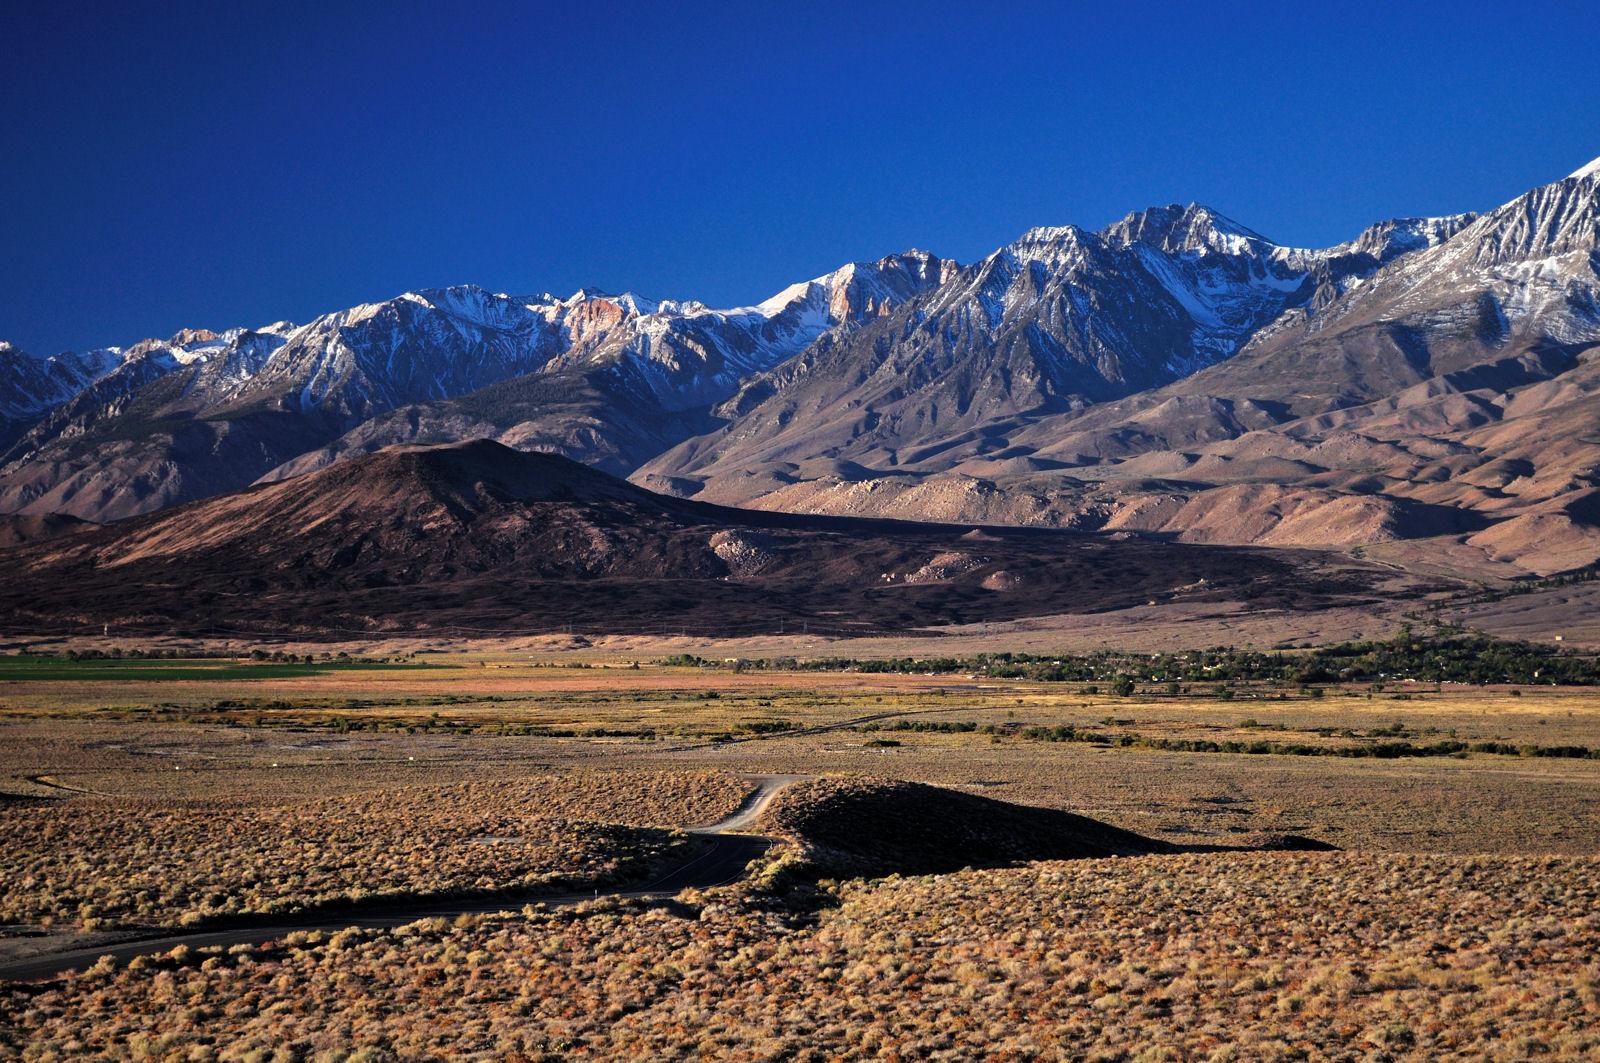 Inyo-White Mountains_owens völgy nappal.jpg